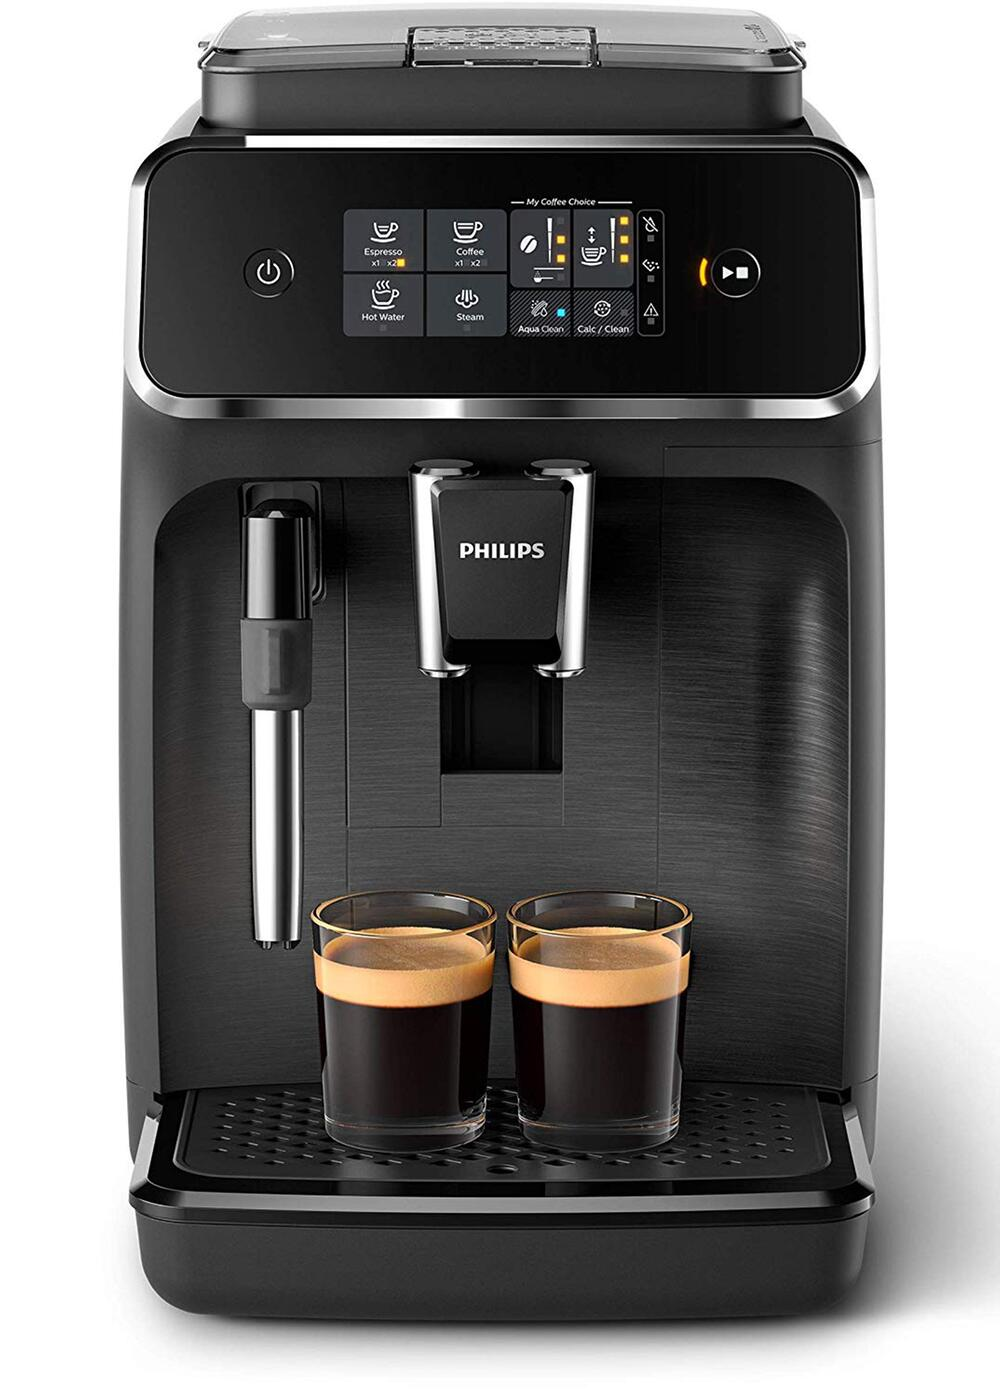 Amazon Prime Day, Schnäppchen, shoppen, sparen, günstig, Deals, Rabatt, philips, kaffeevollautomat